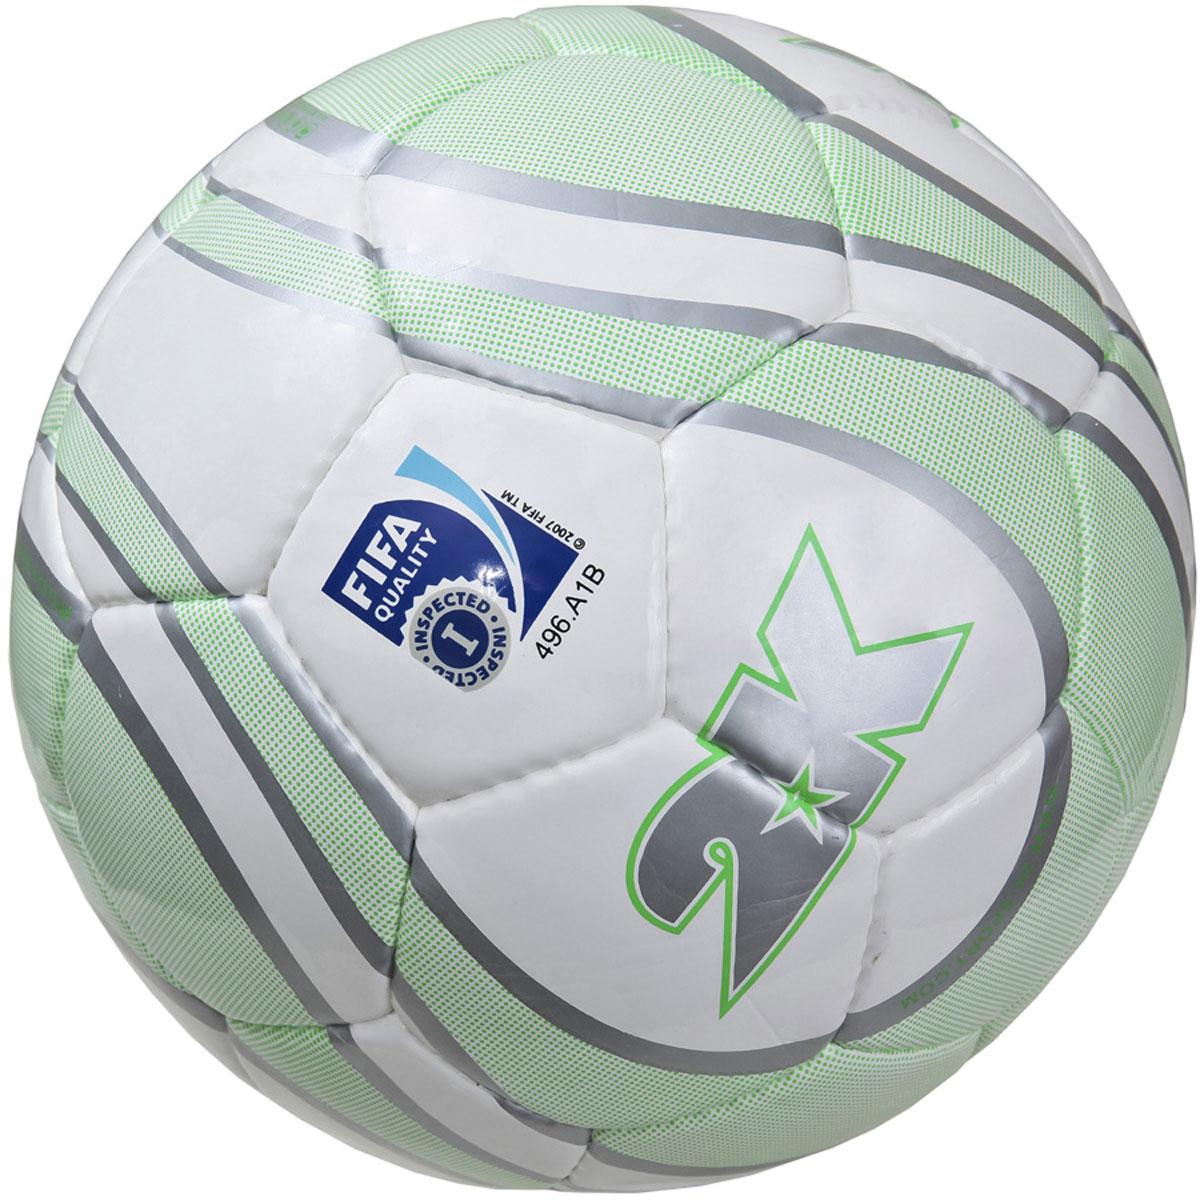 "Мяч футбольный 2K Sport ""Parity"", цвет: белый, серый, зеленый. Размер 5 127082F"